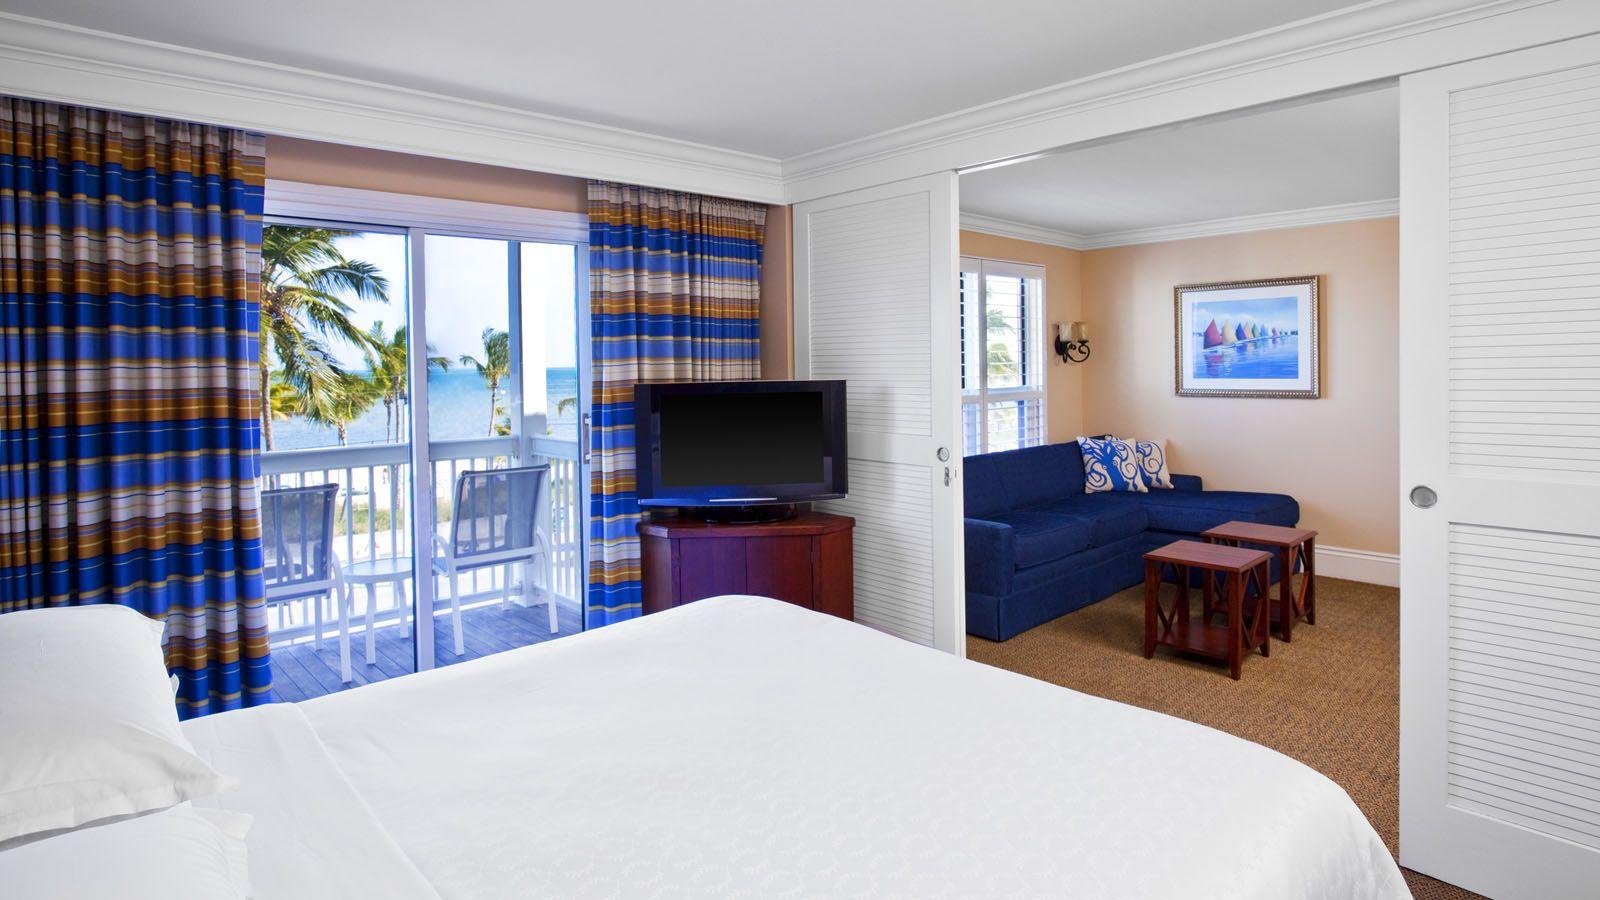 Two Bedroom Suite Pier House Resort Spa Pier House Pier House Resort Two Bedroom Suites